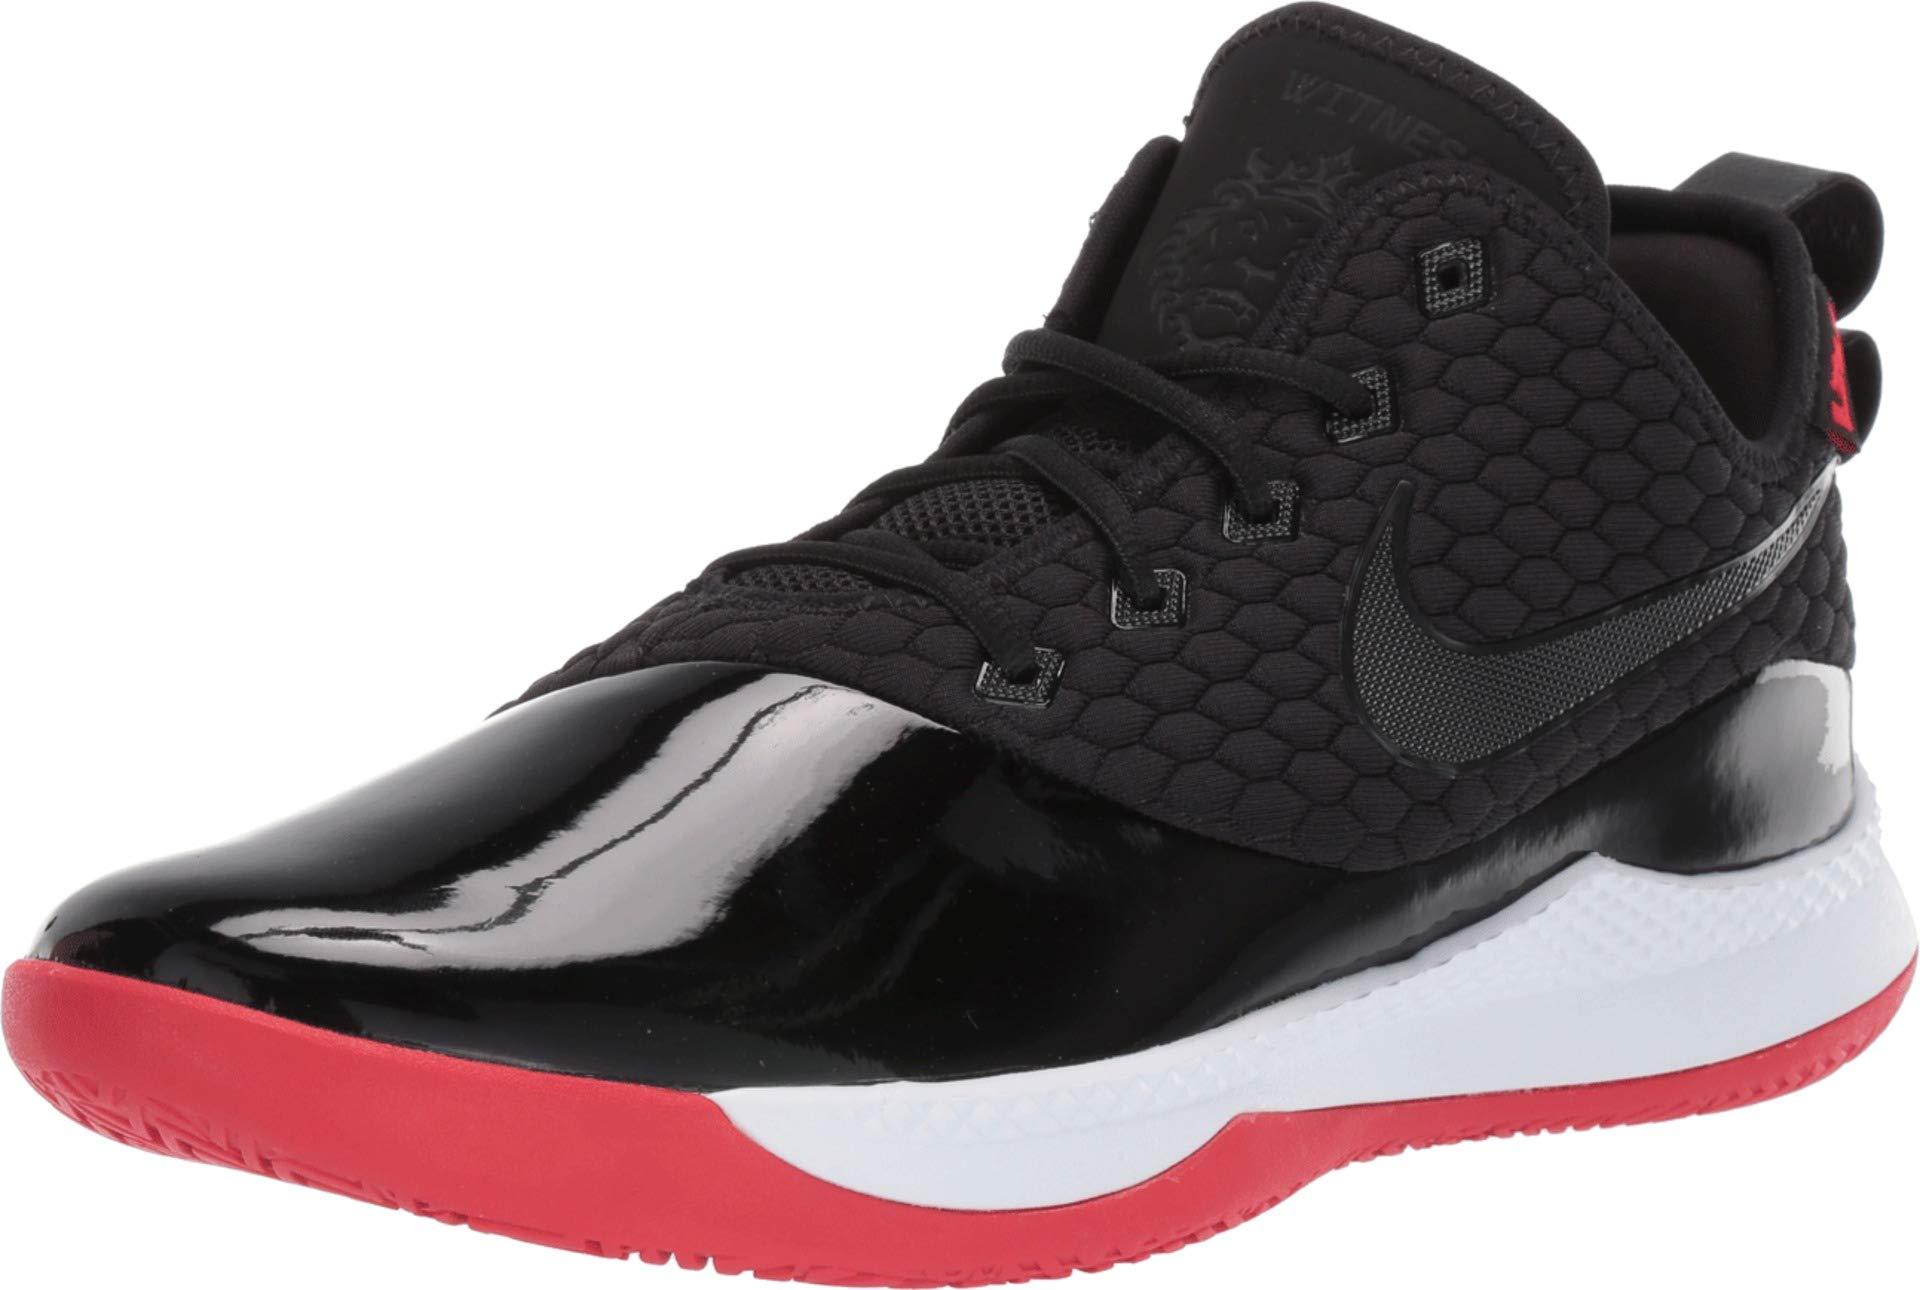 Nike Men's Lebron Witness III PRM Basketball Shoe Black/White/University Red Size 11 M US by Nike